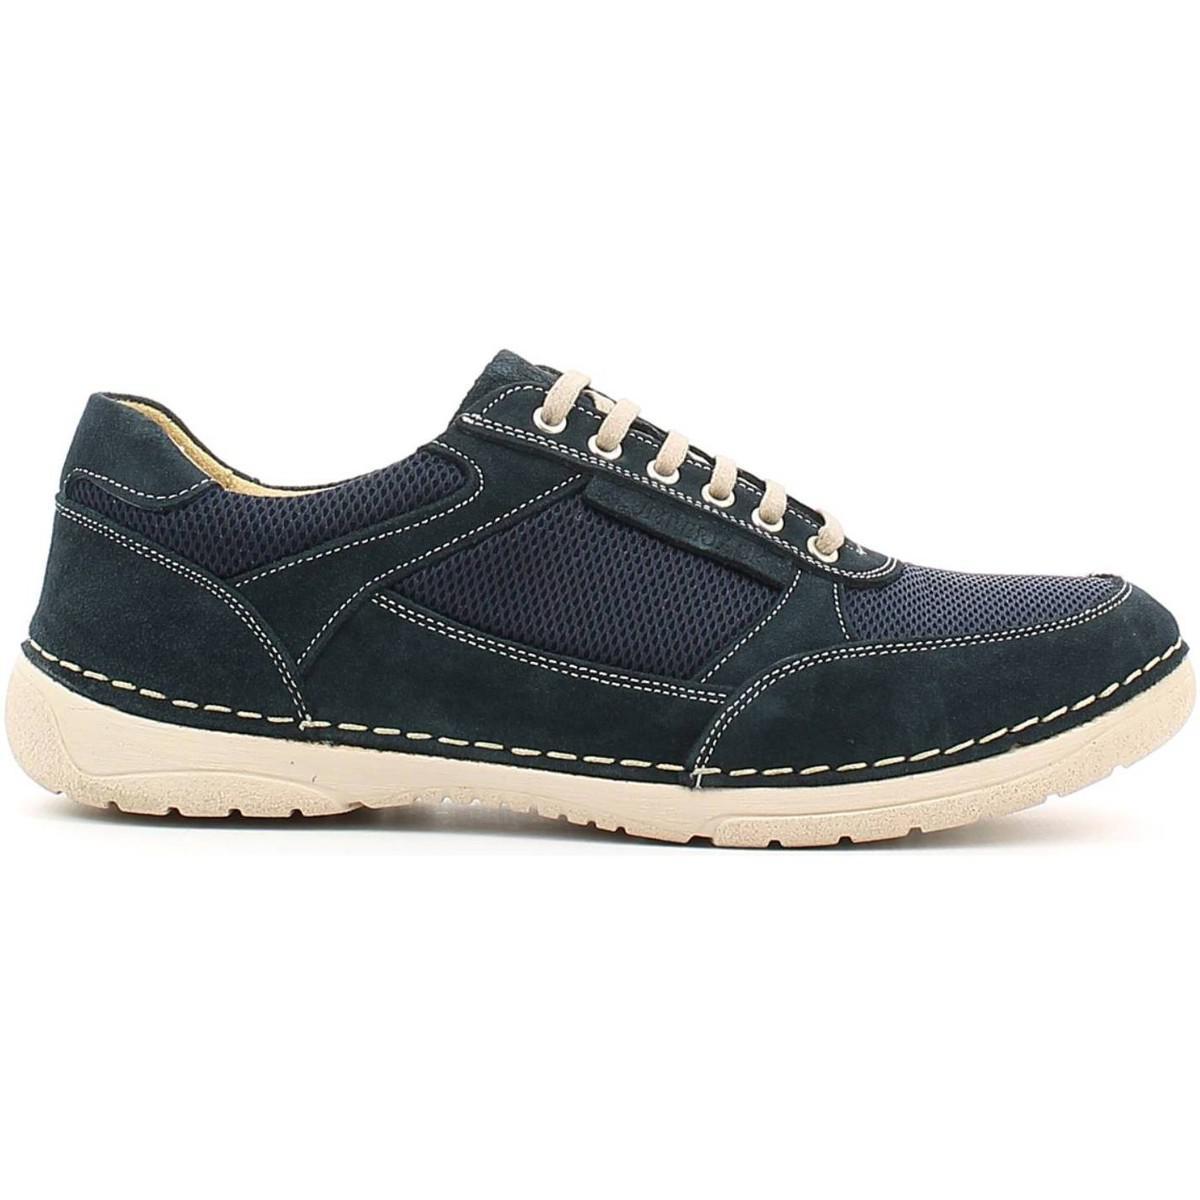 Lumberjack Sm10905 001 M02 Schuhes With Laces Man Man Laces Navy Bleu Men's ... f86055